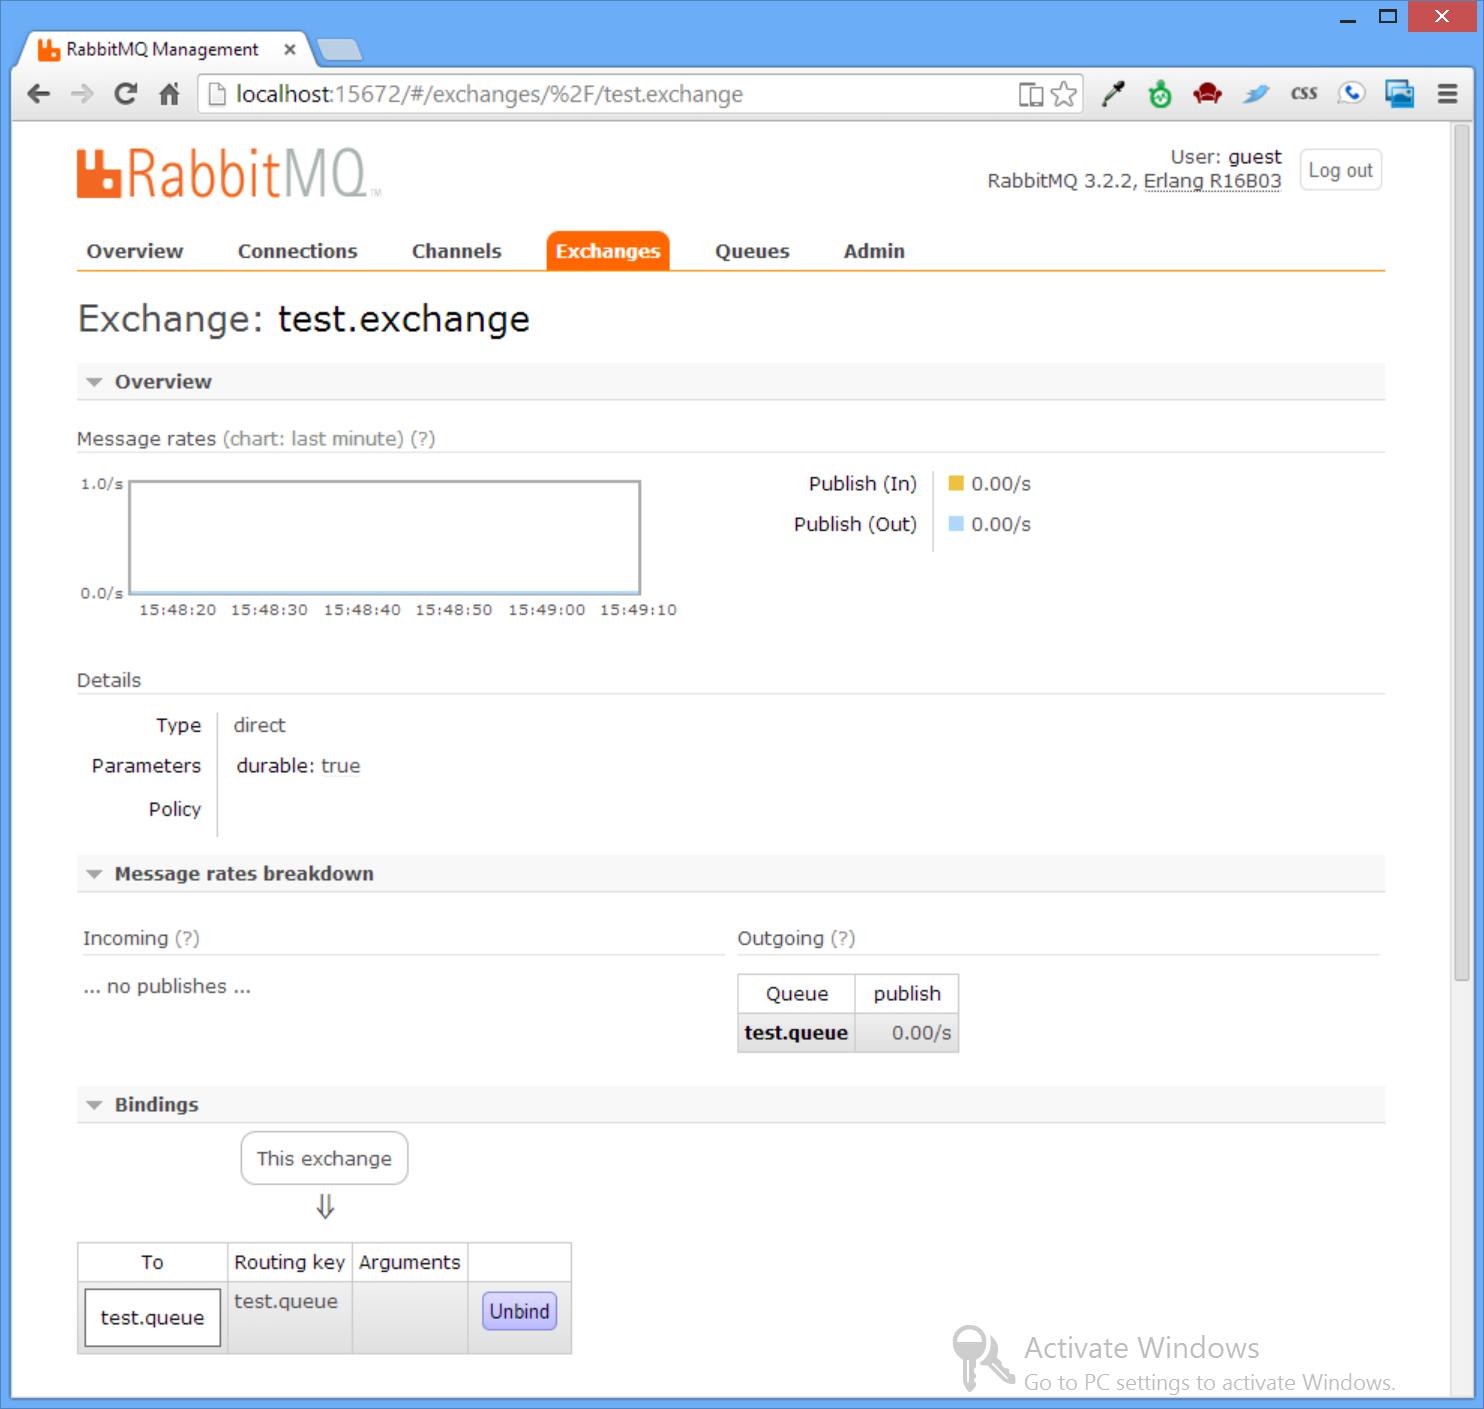 UI - Test Exchange